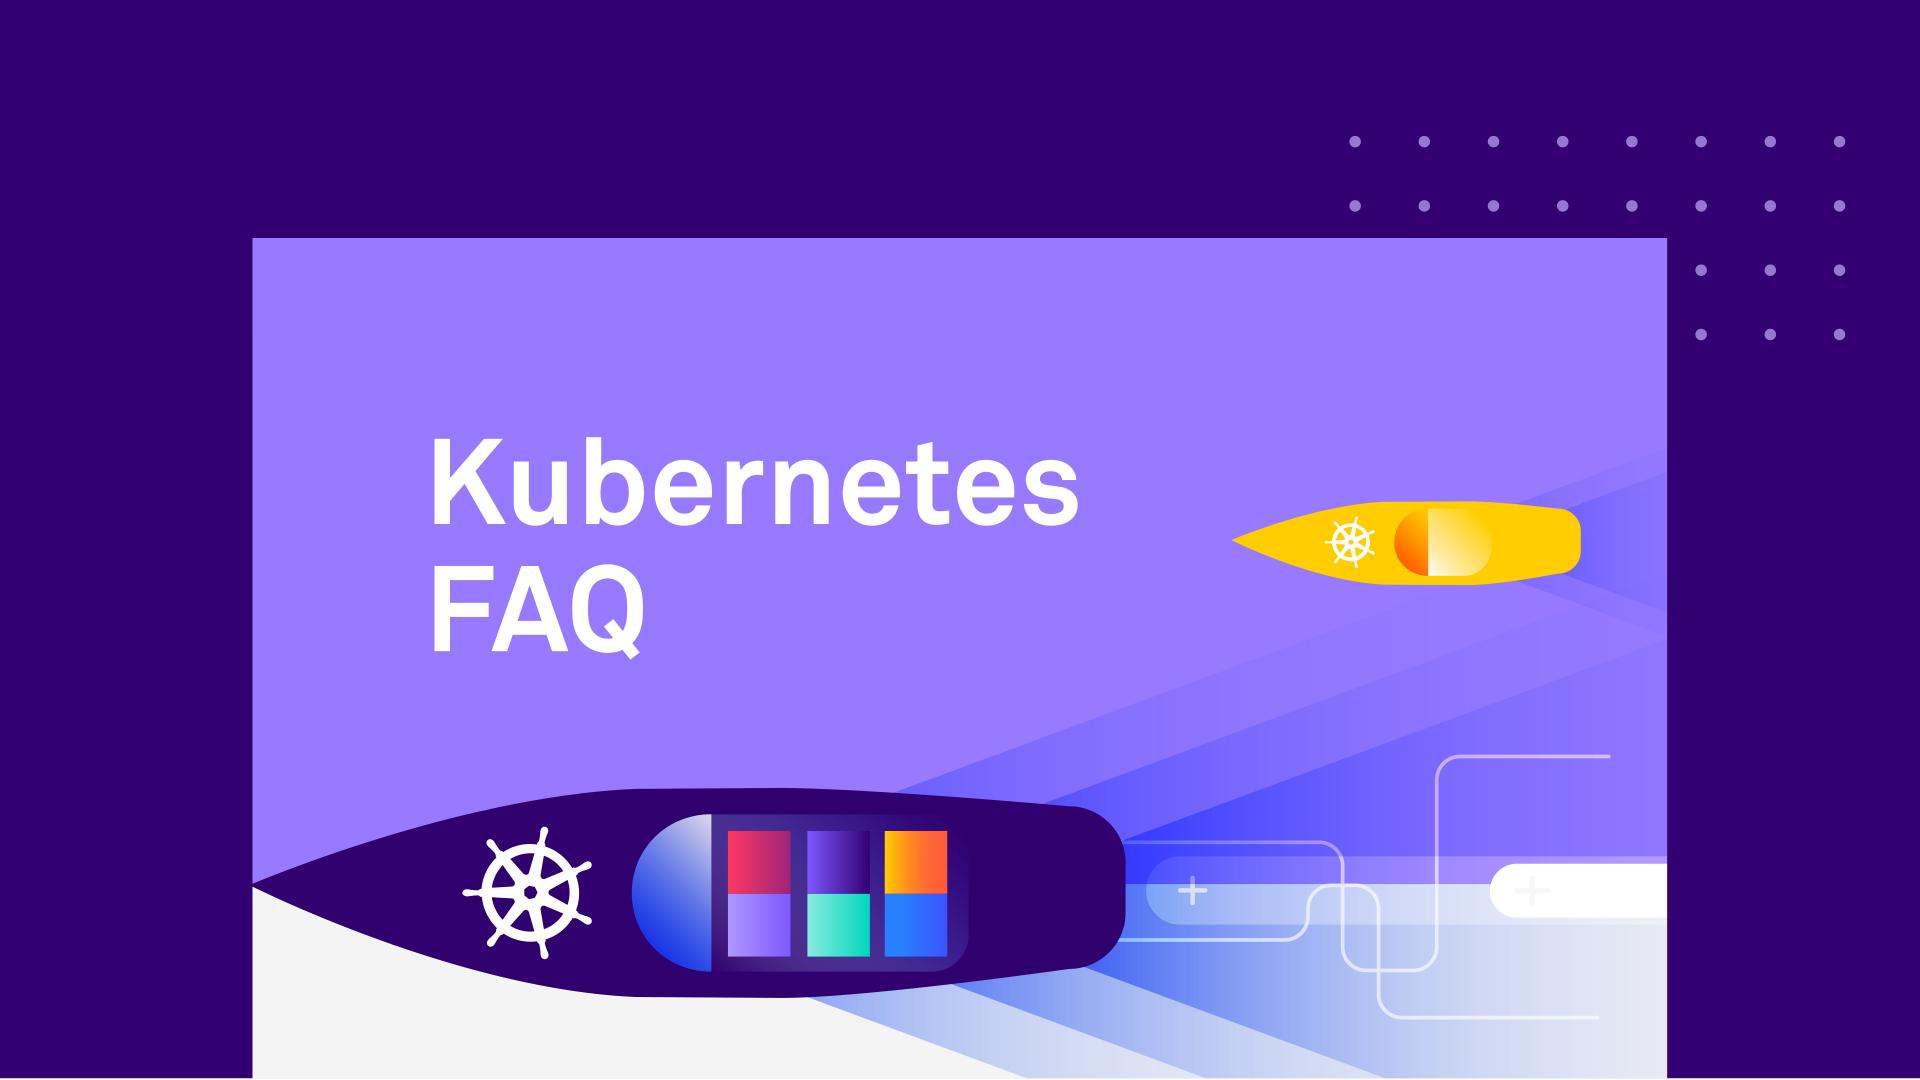 Kubernetes FAQ